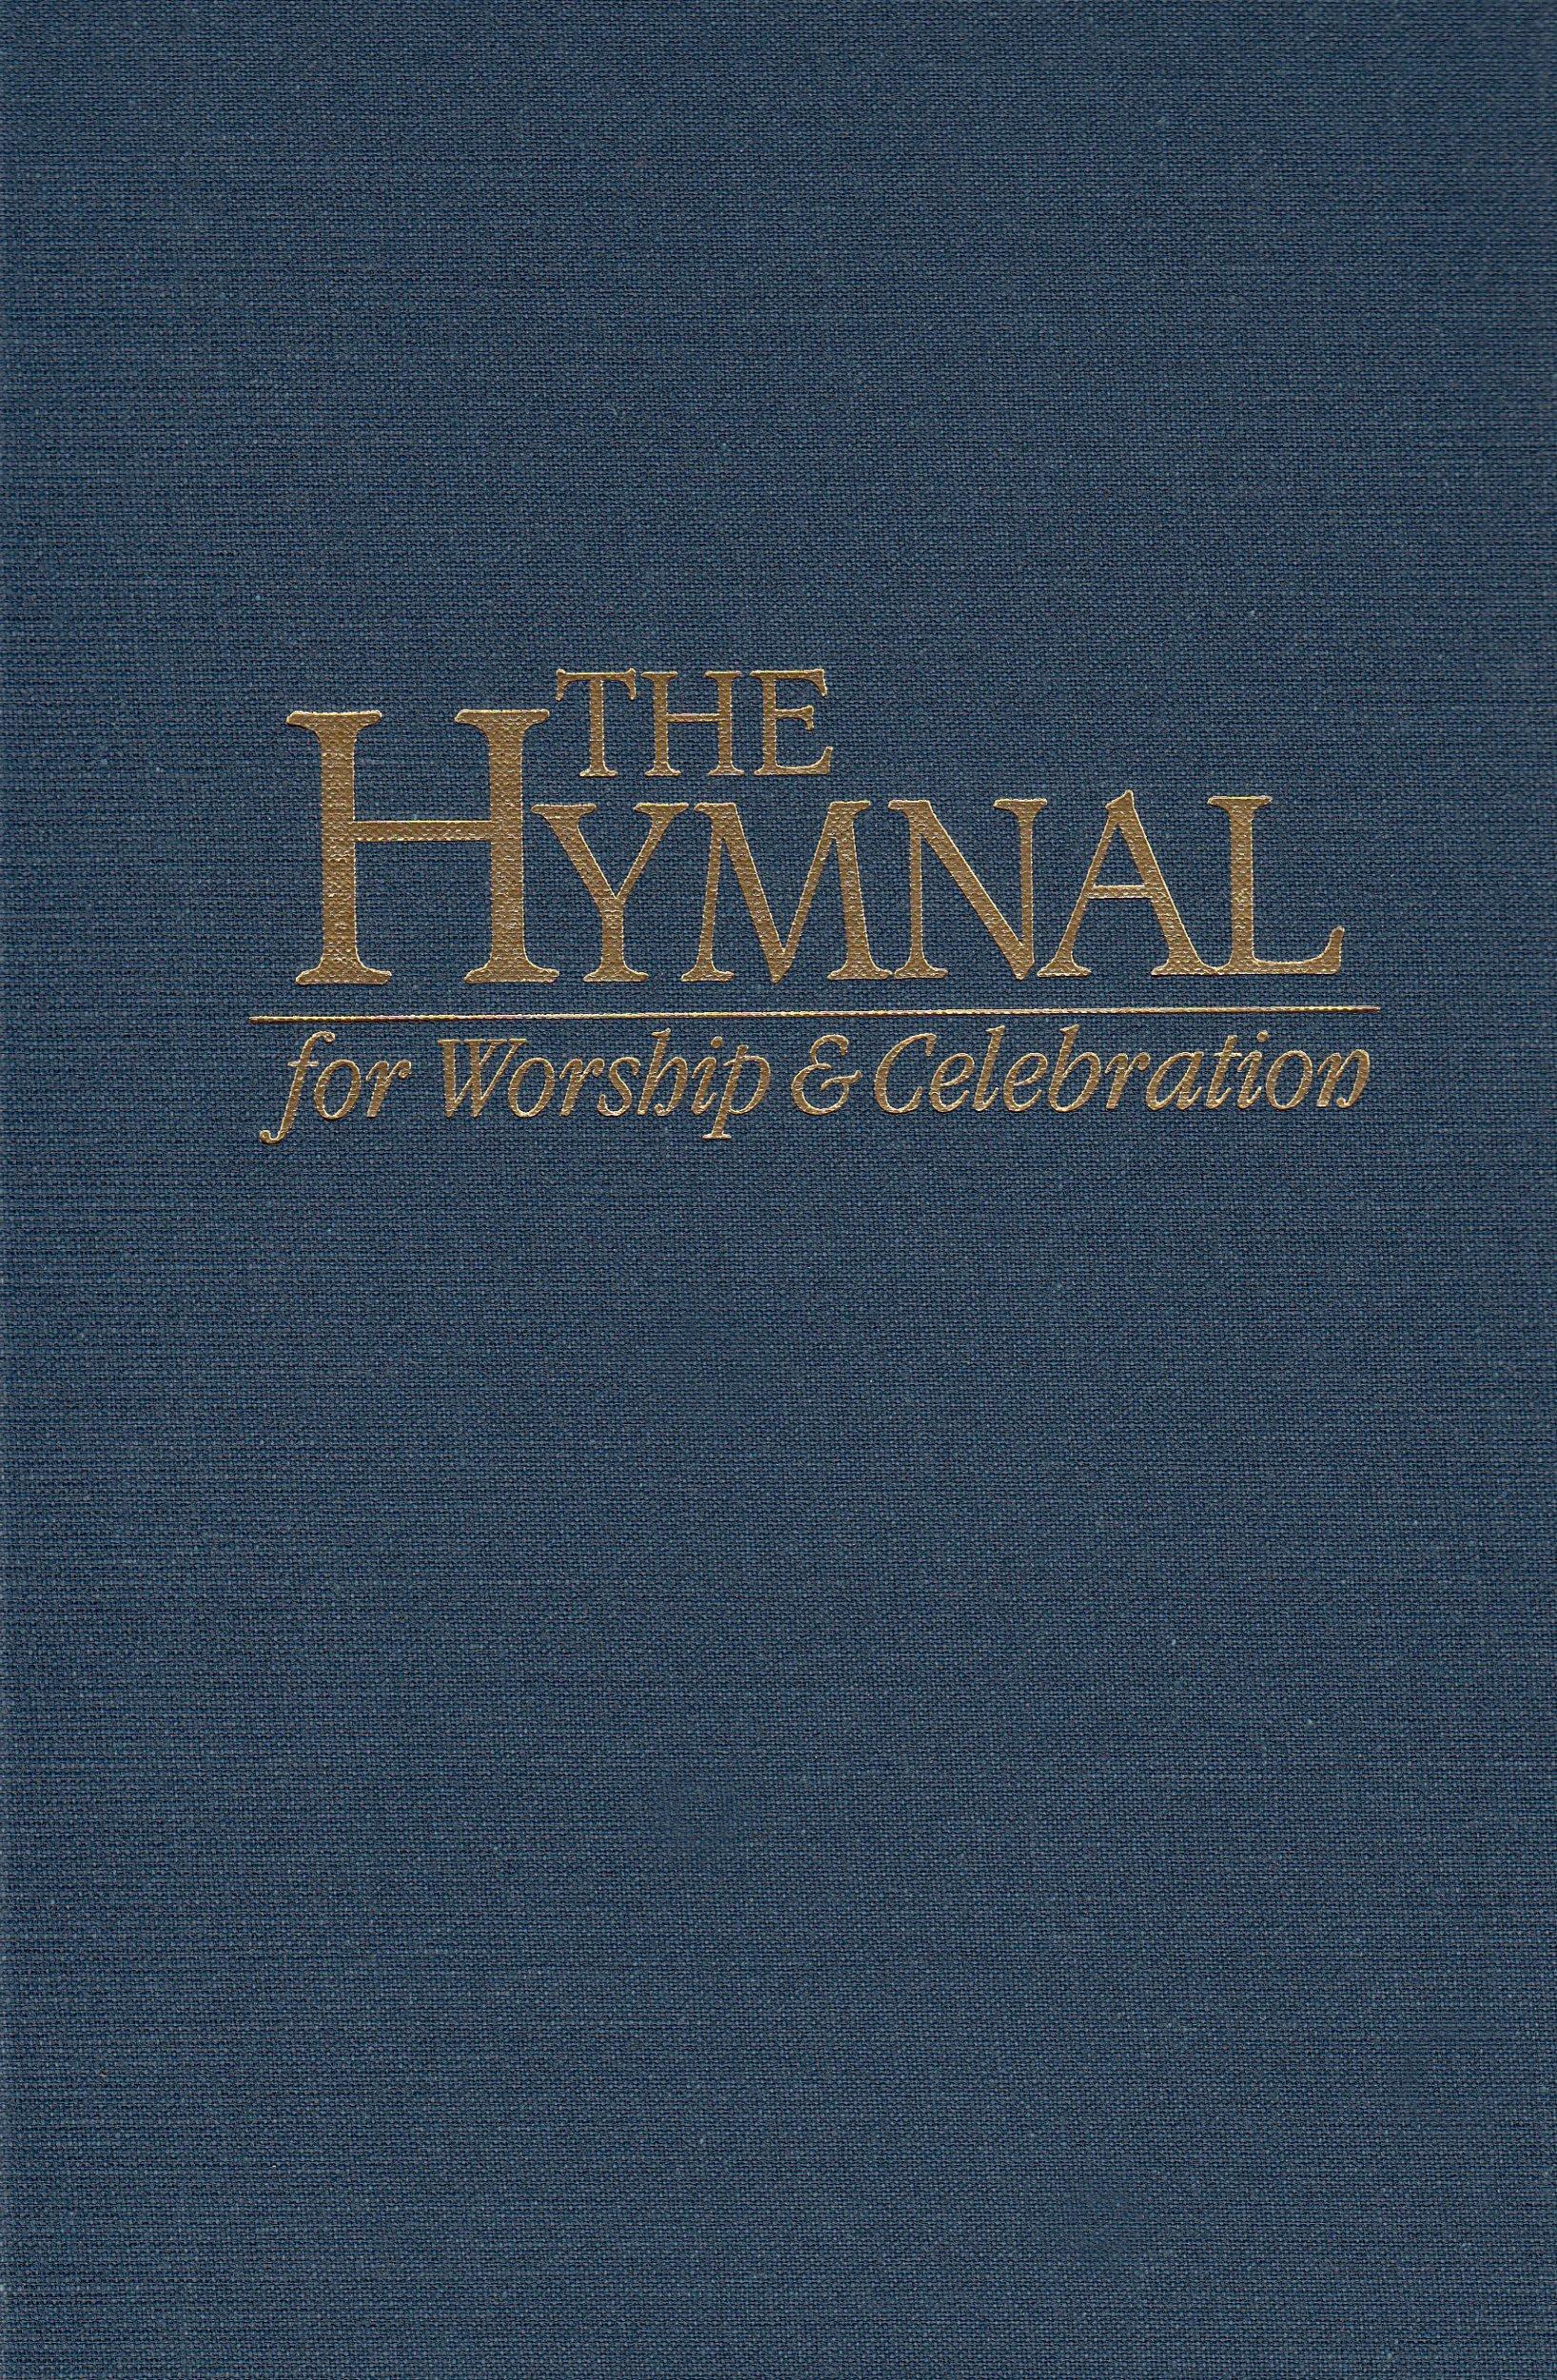 Everyone pdf celebration hymnal for